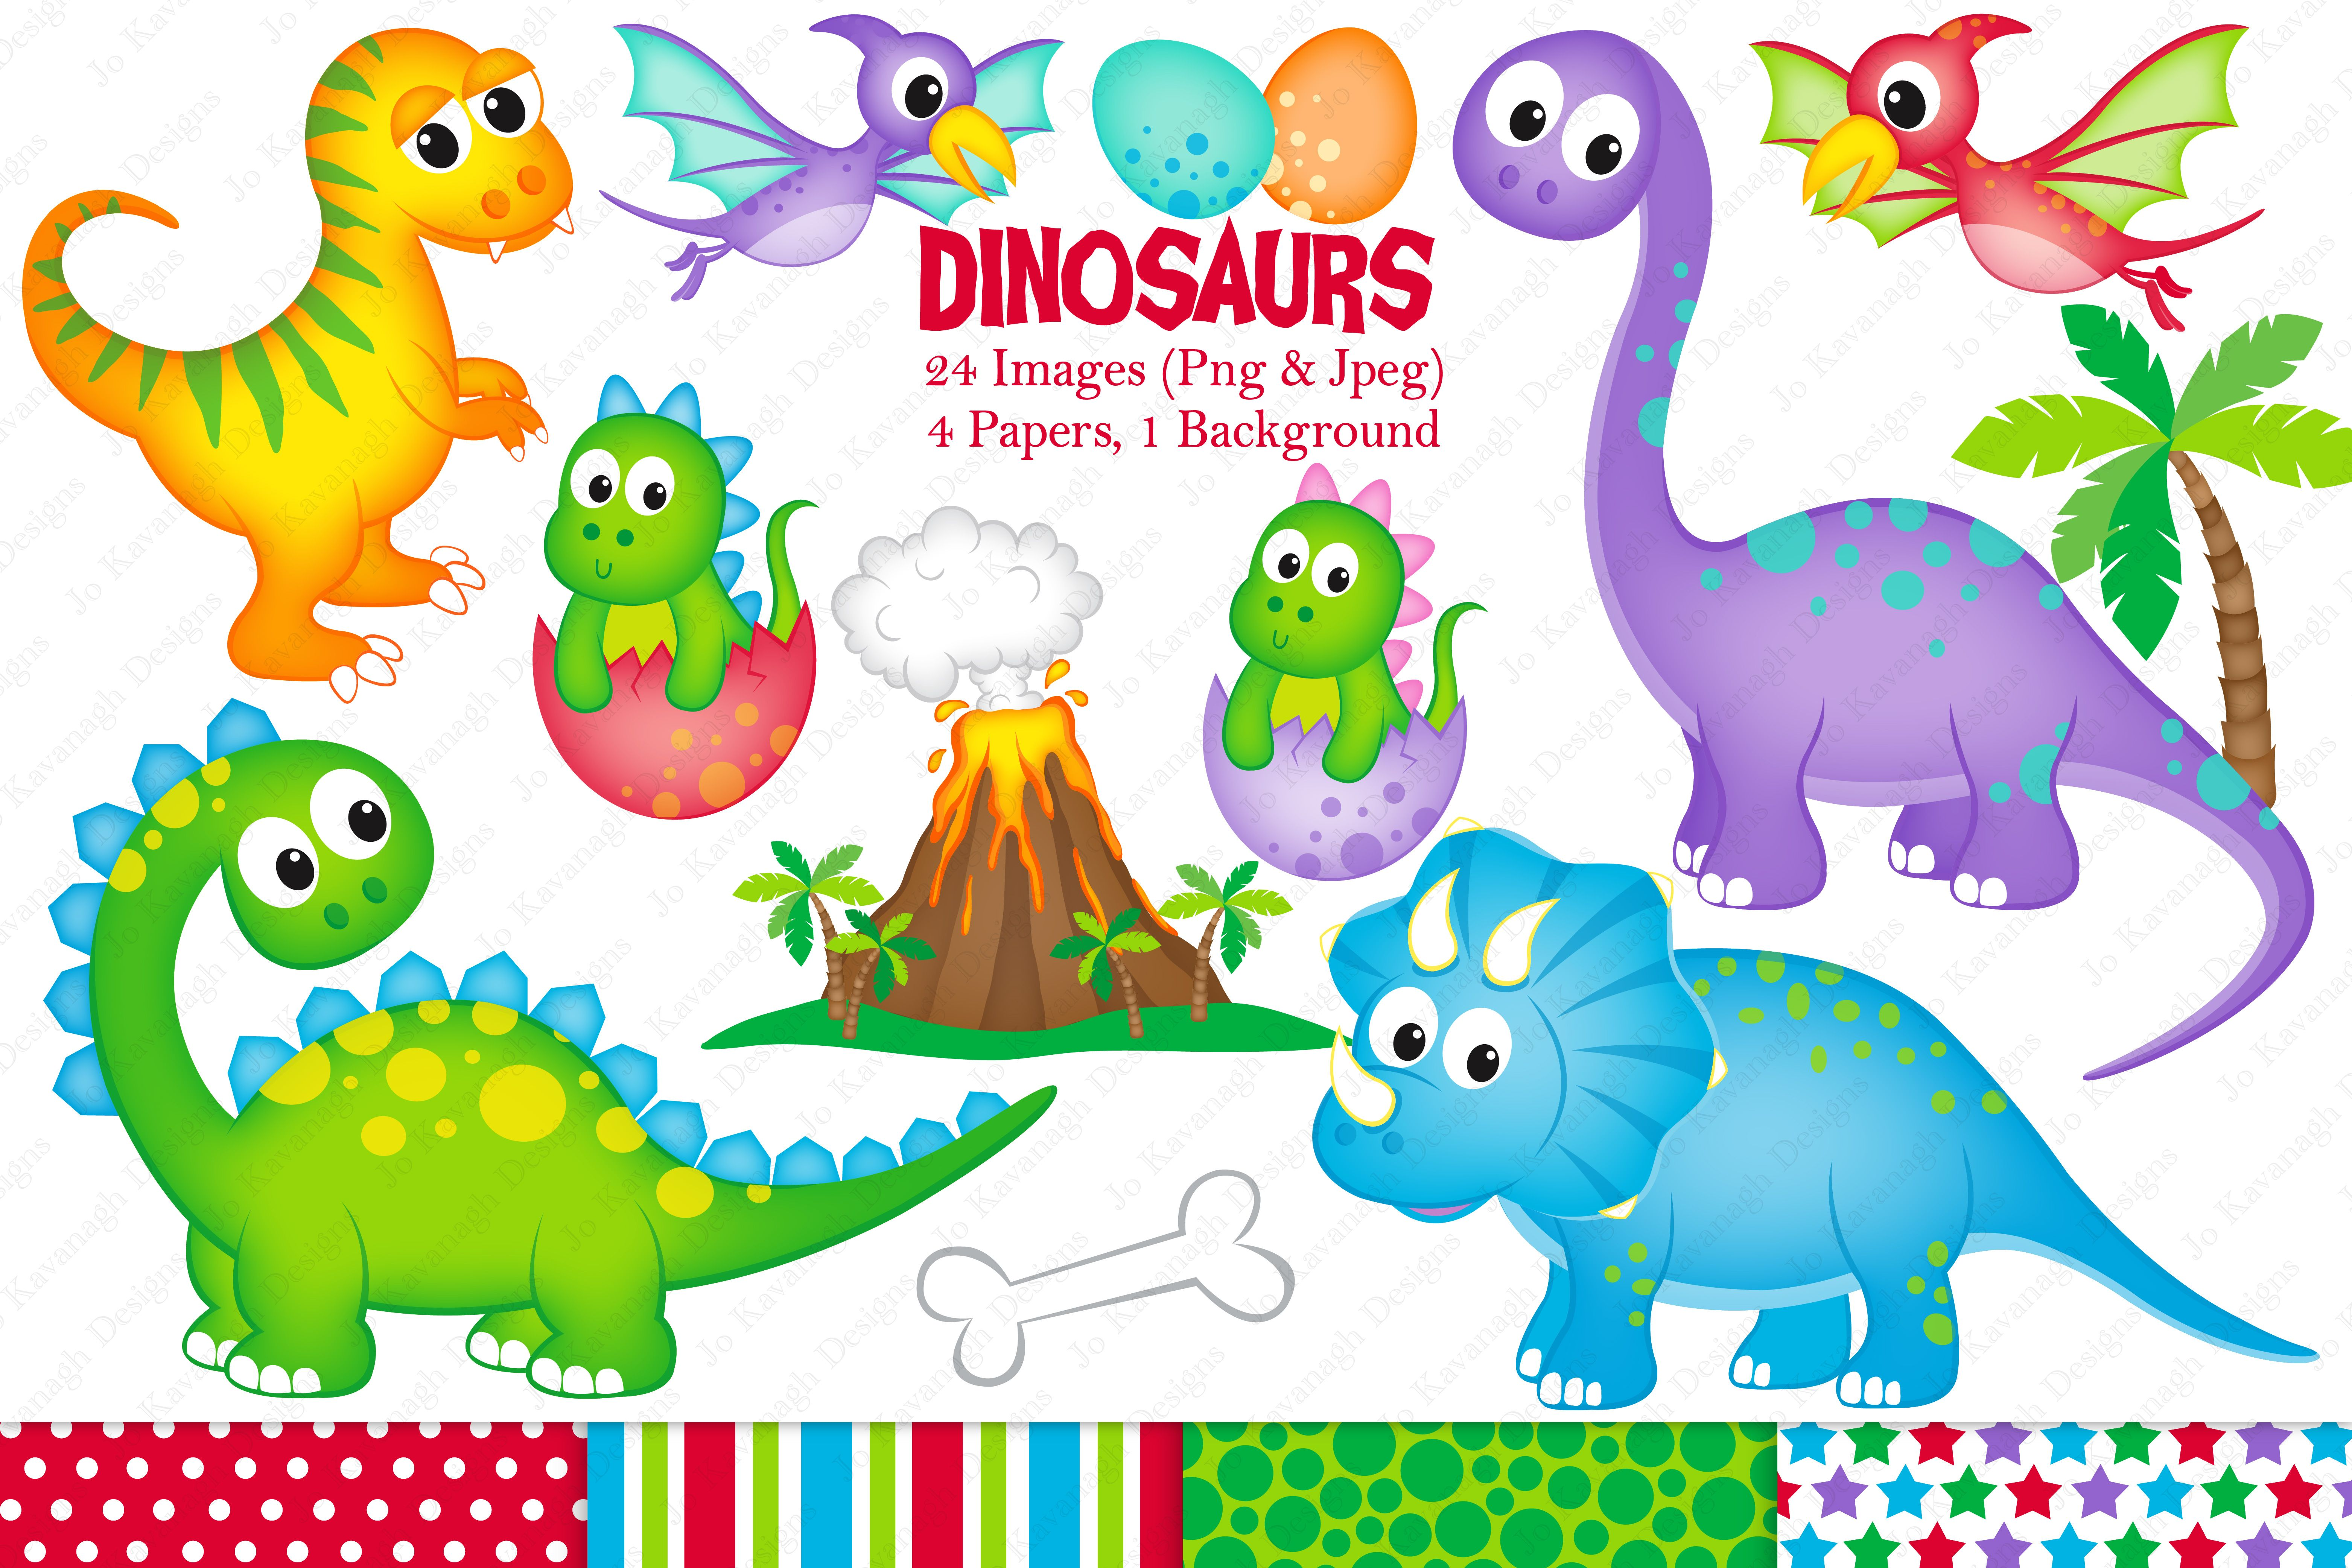 Dinosaur Clipart Dinosaurs Graphics Illustrations T Rex 74845 Illustrations Design Bundles Graphic Illustration Clip Art Dinosaur